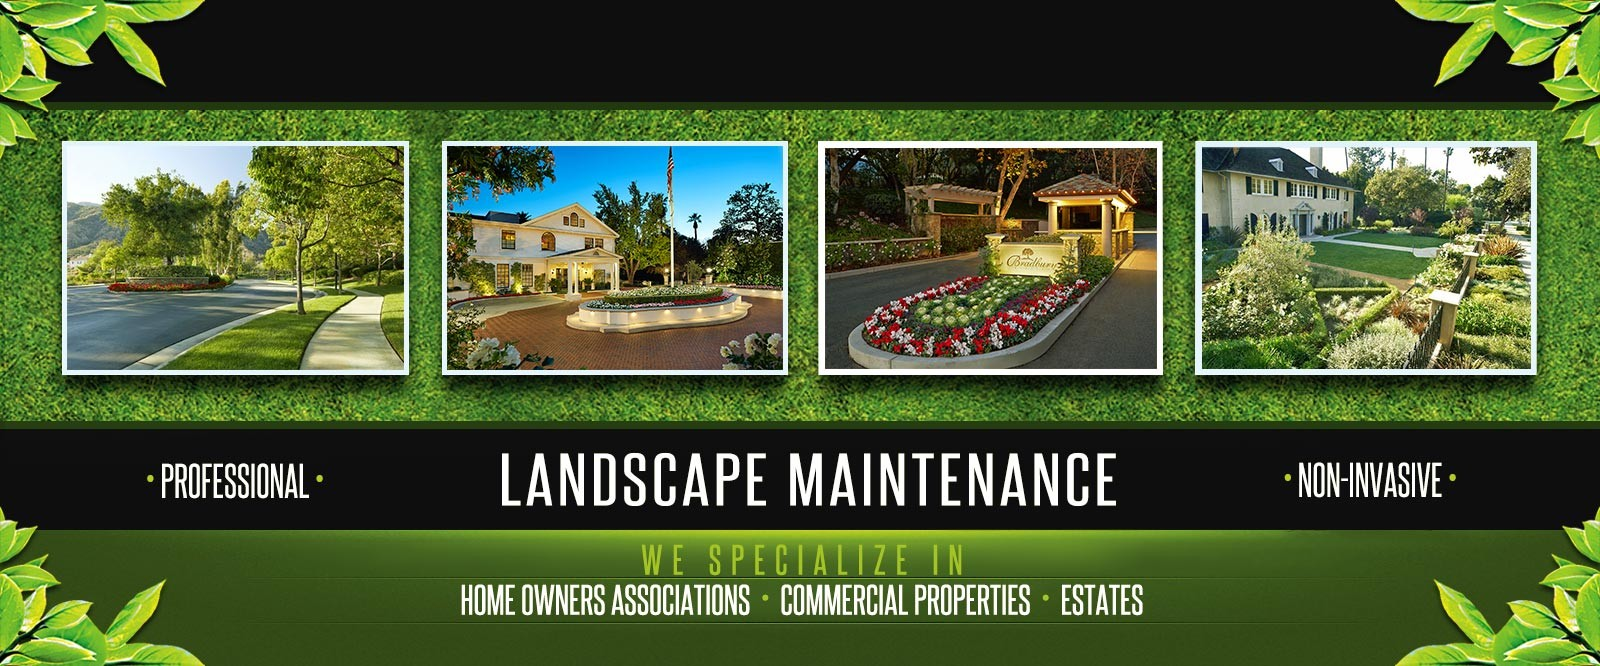 HOA, Commercial, and Estate Landscape Maintenance